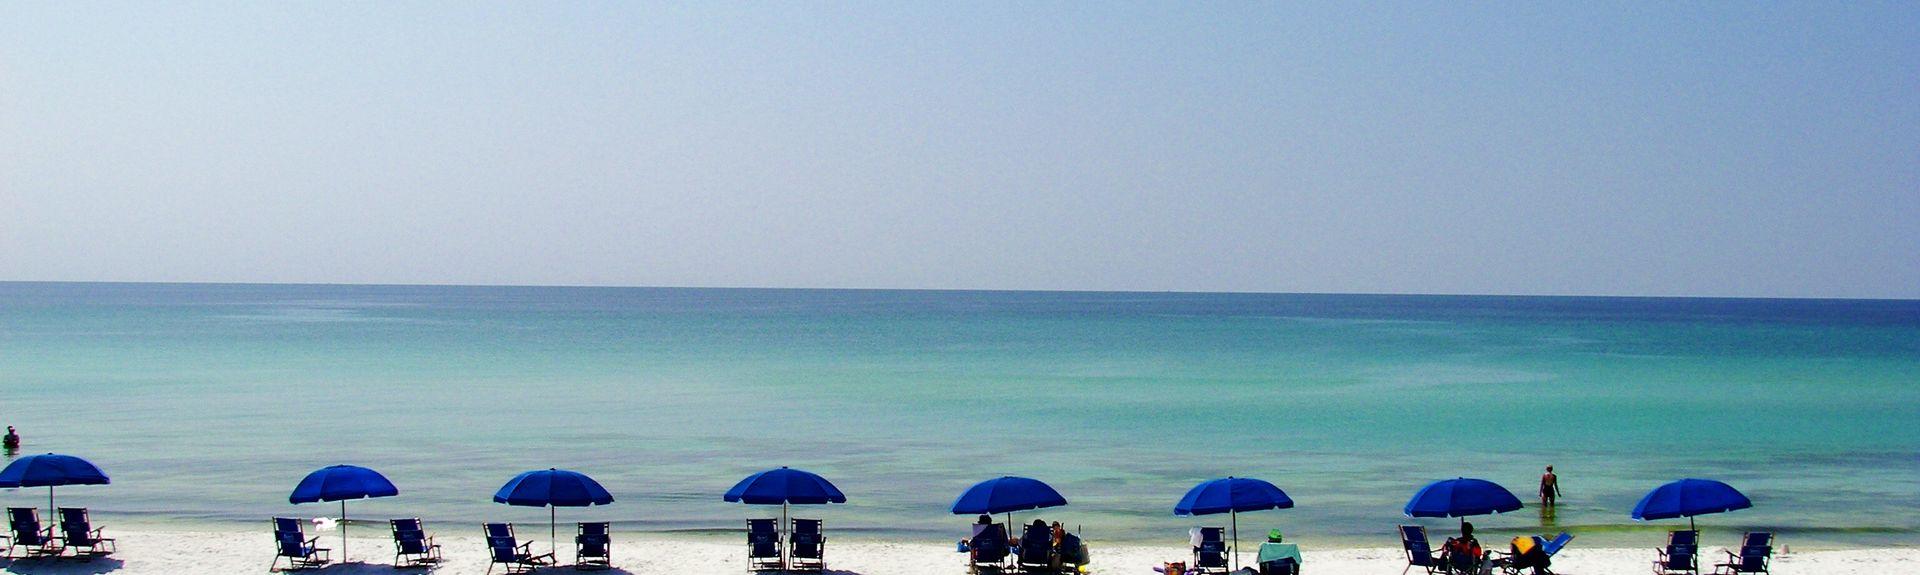 Emerald Shores (Miramar Beach, Florida, Vereinigte Staaten)